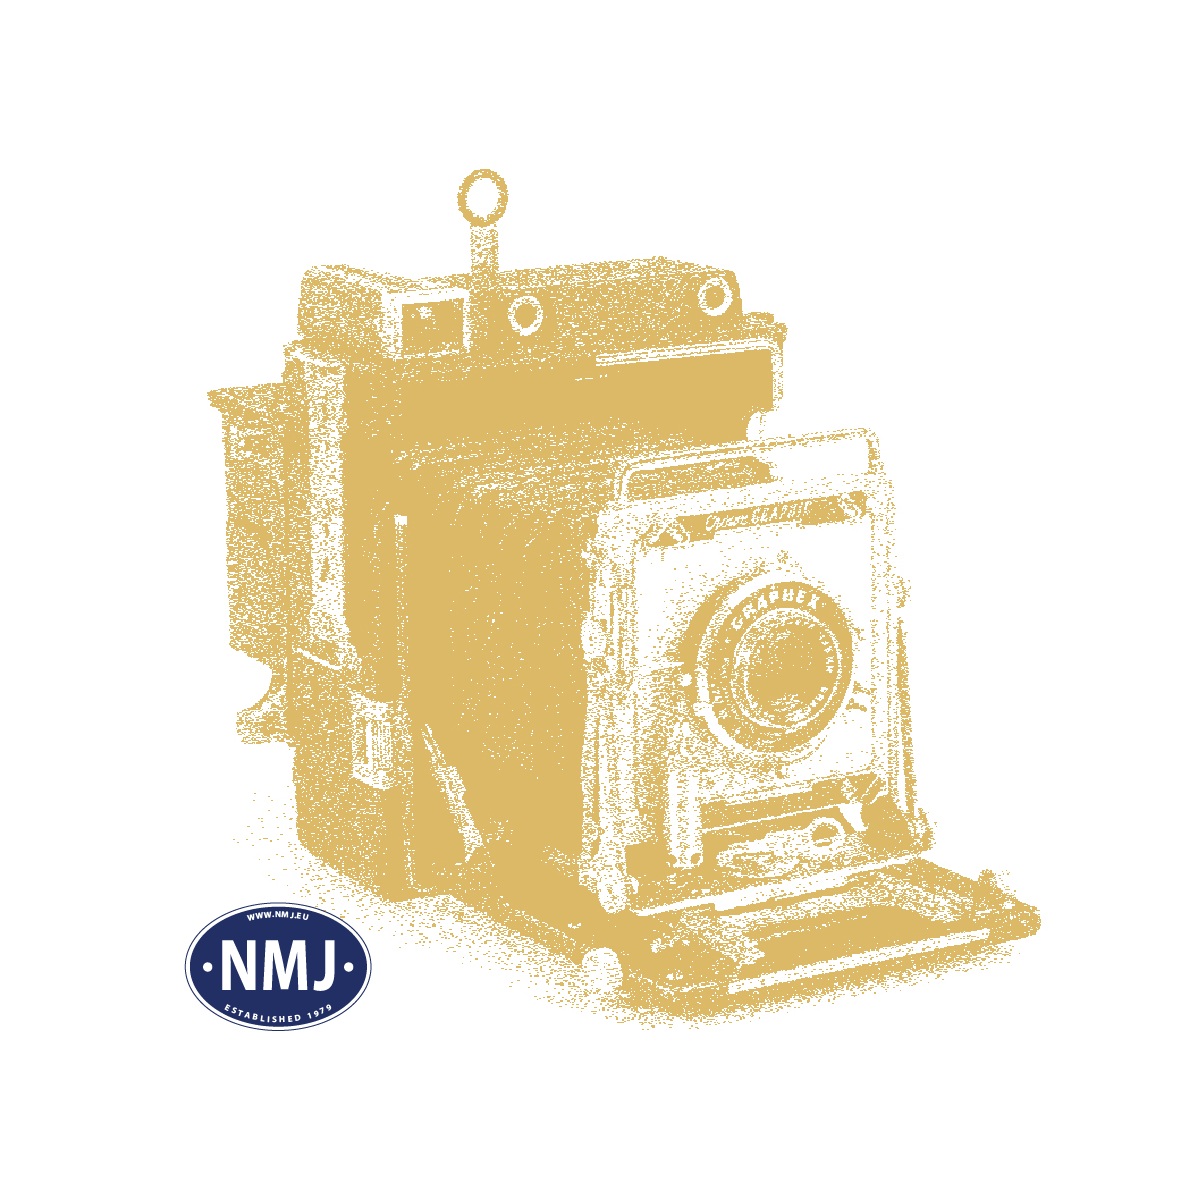 NMJT81.301AC - NMJ Topline NSB Motorvognsett BM73b, Rød Regiontog design, AC